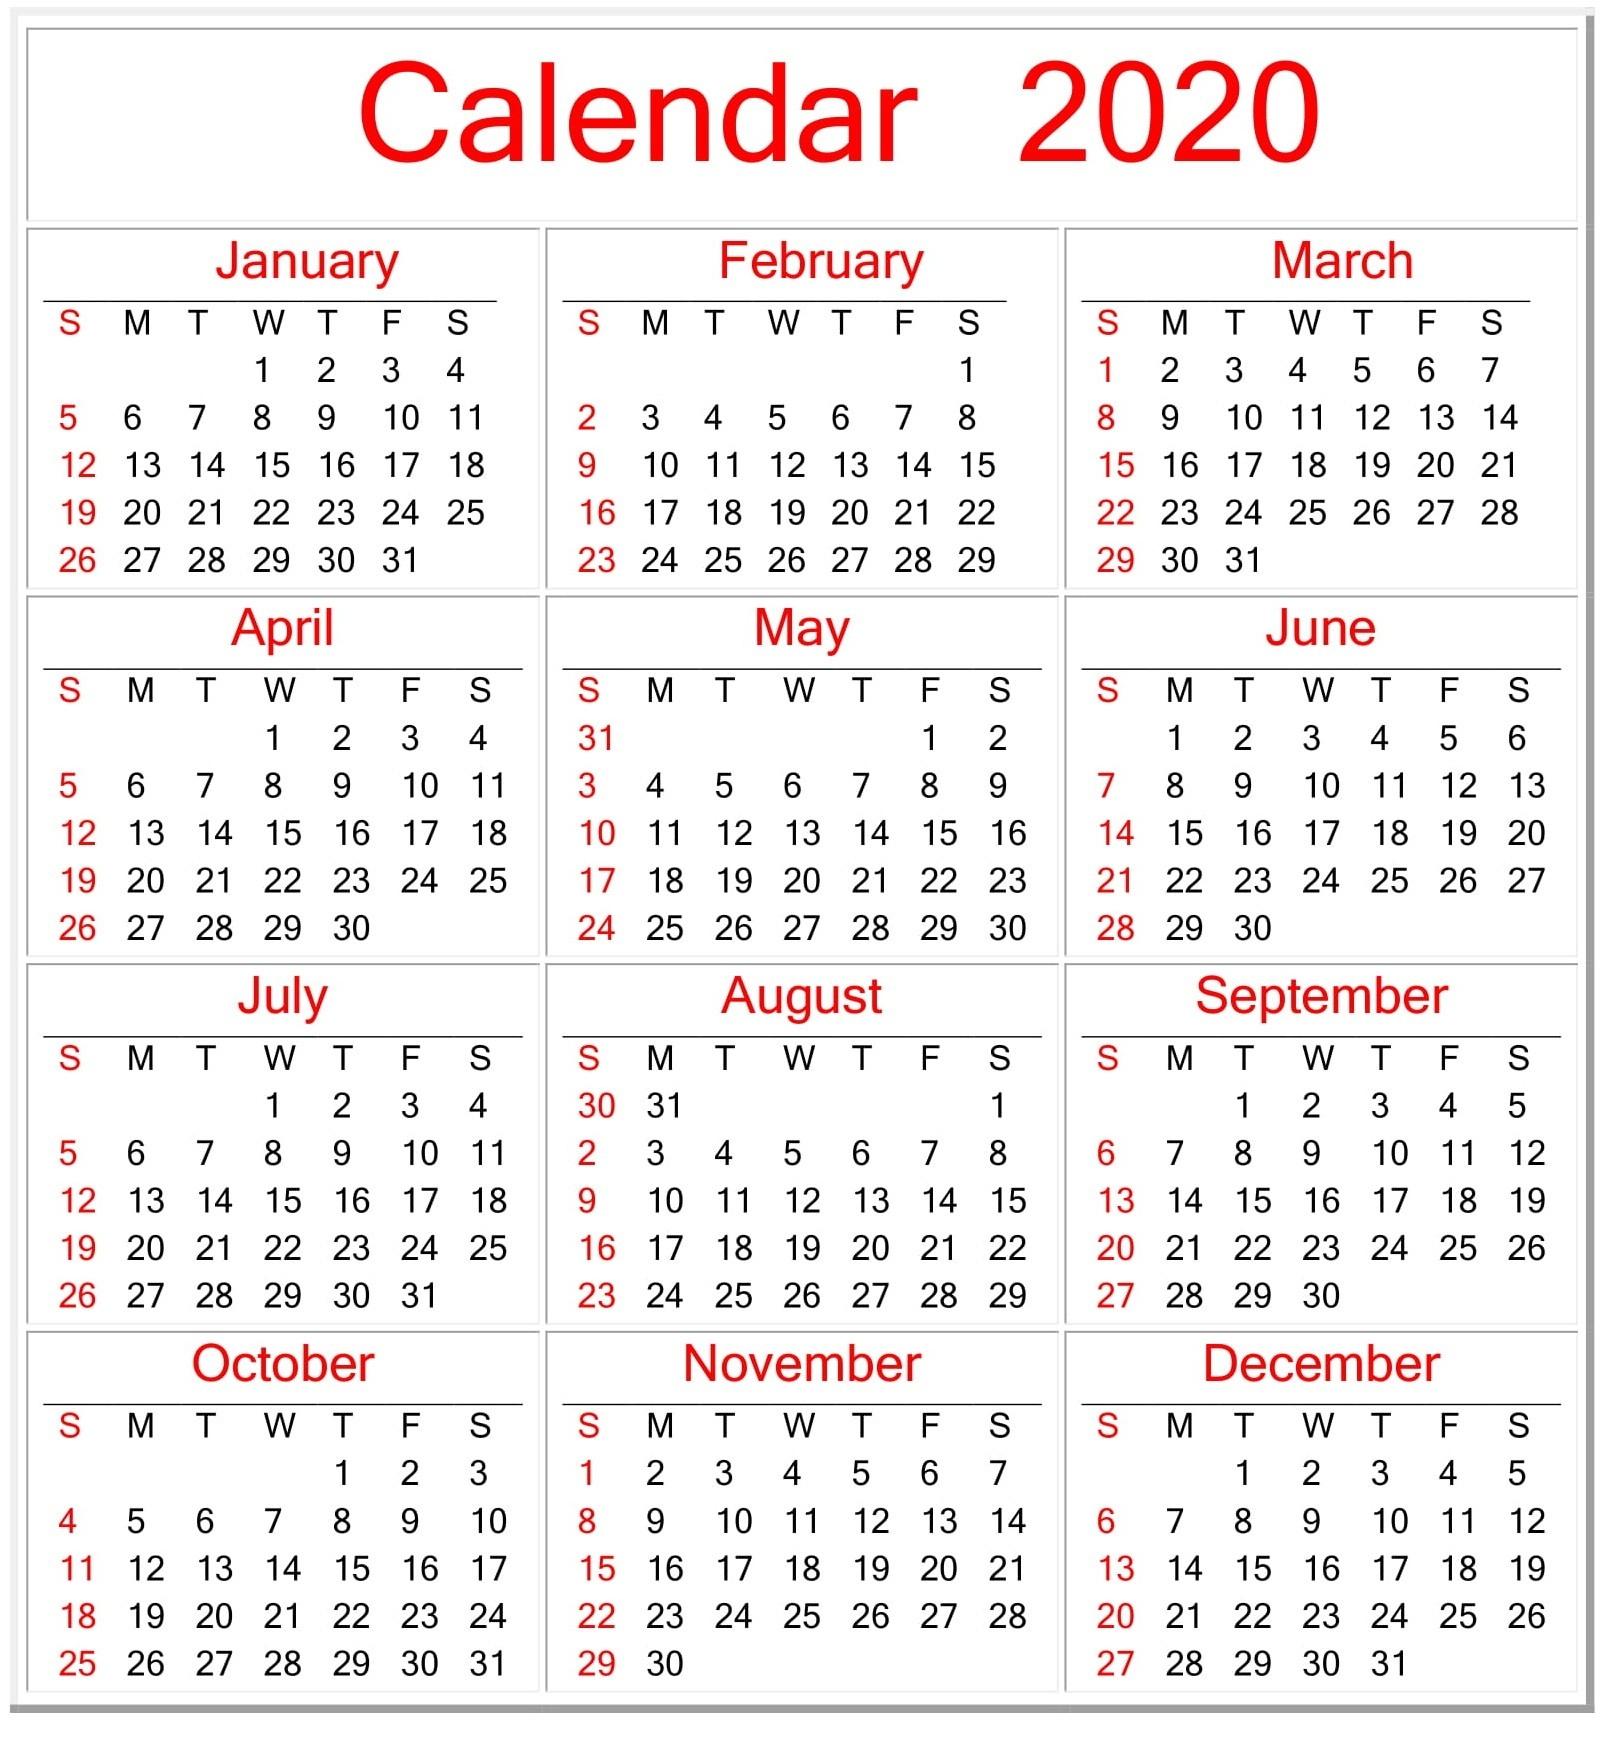 Printable Calendar 2020 Pdf Template – Free Latest Calendar-Printable Employee Vacation Calendar 2020 Template